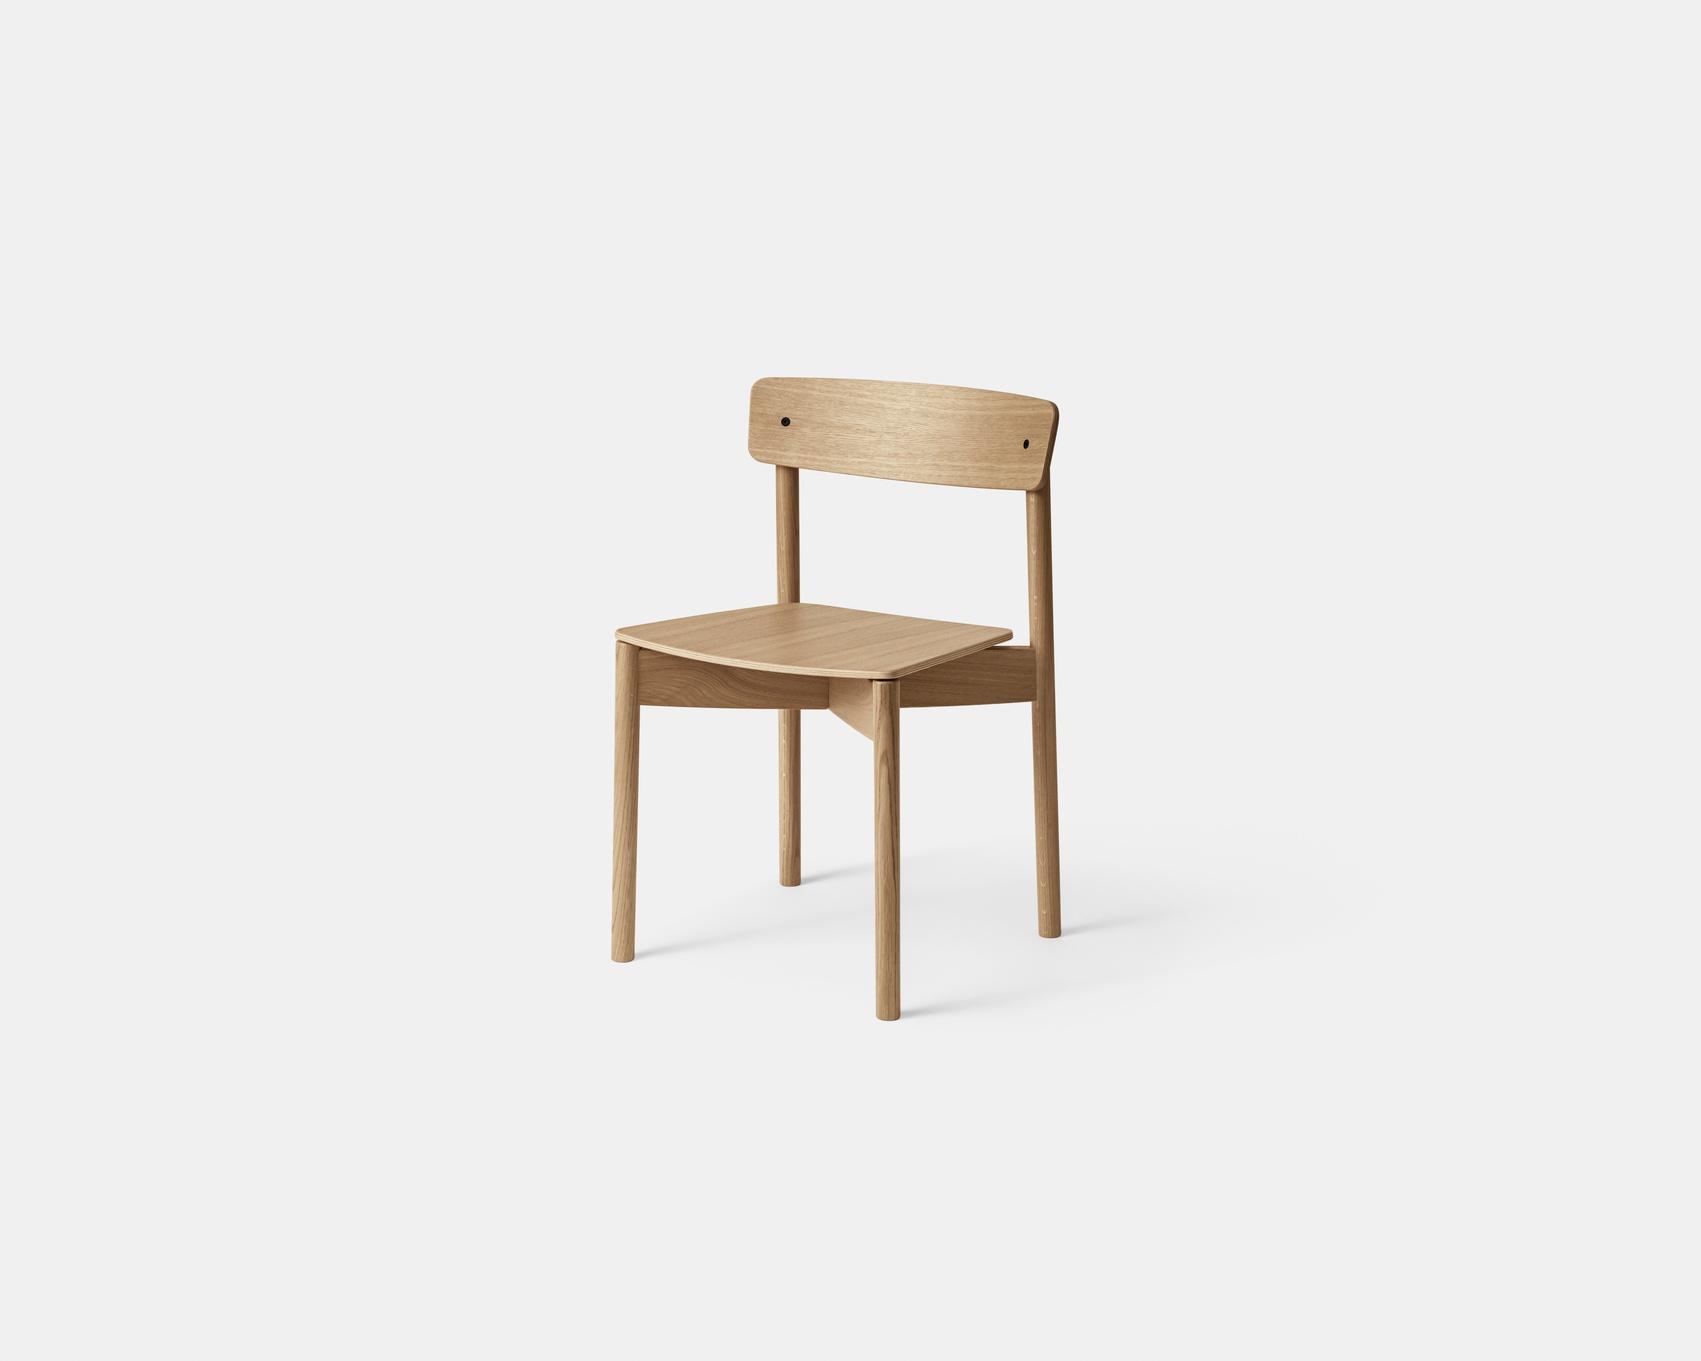 t01-cross-chair_48952509231_o